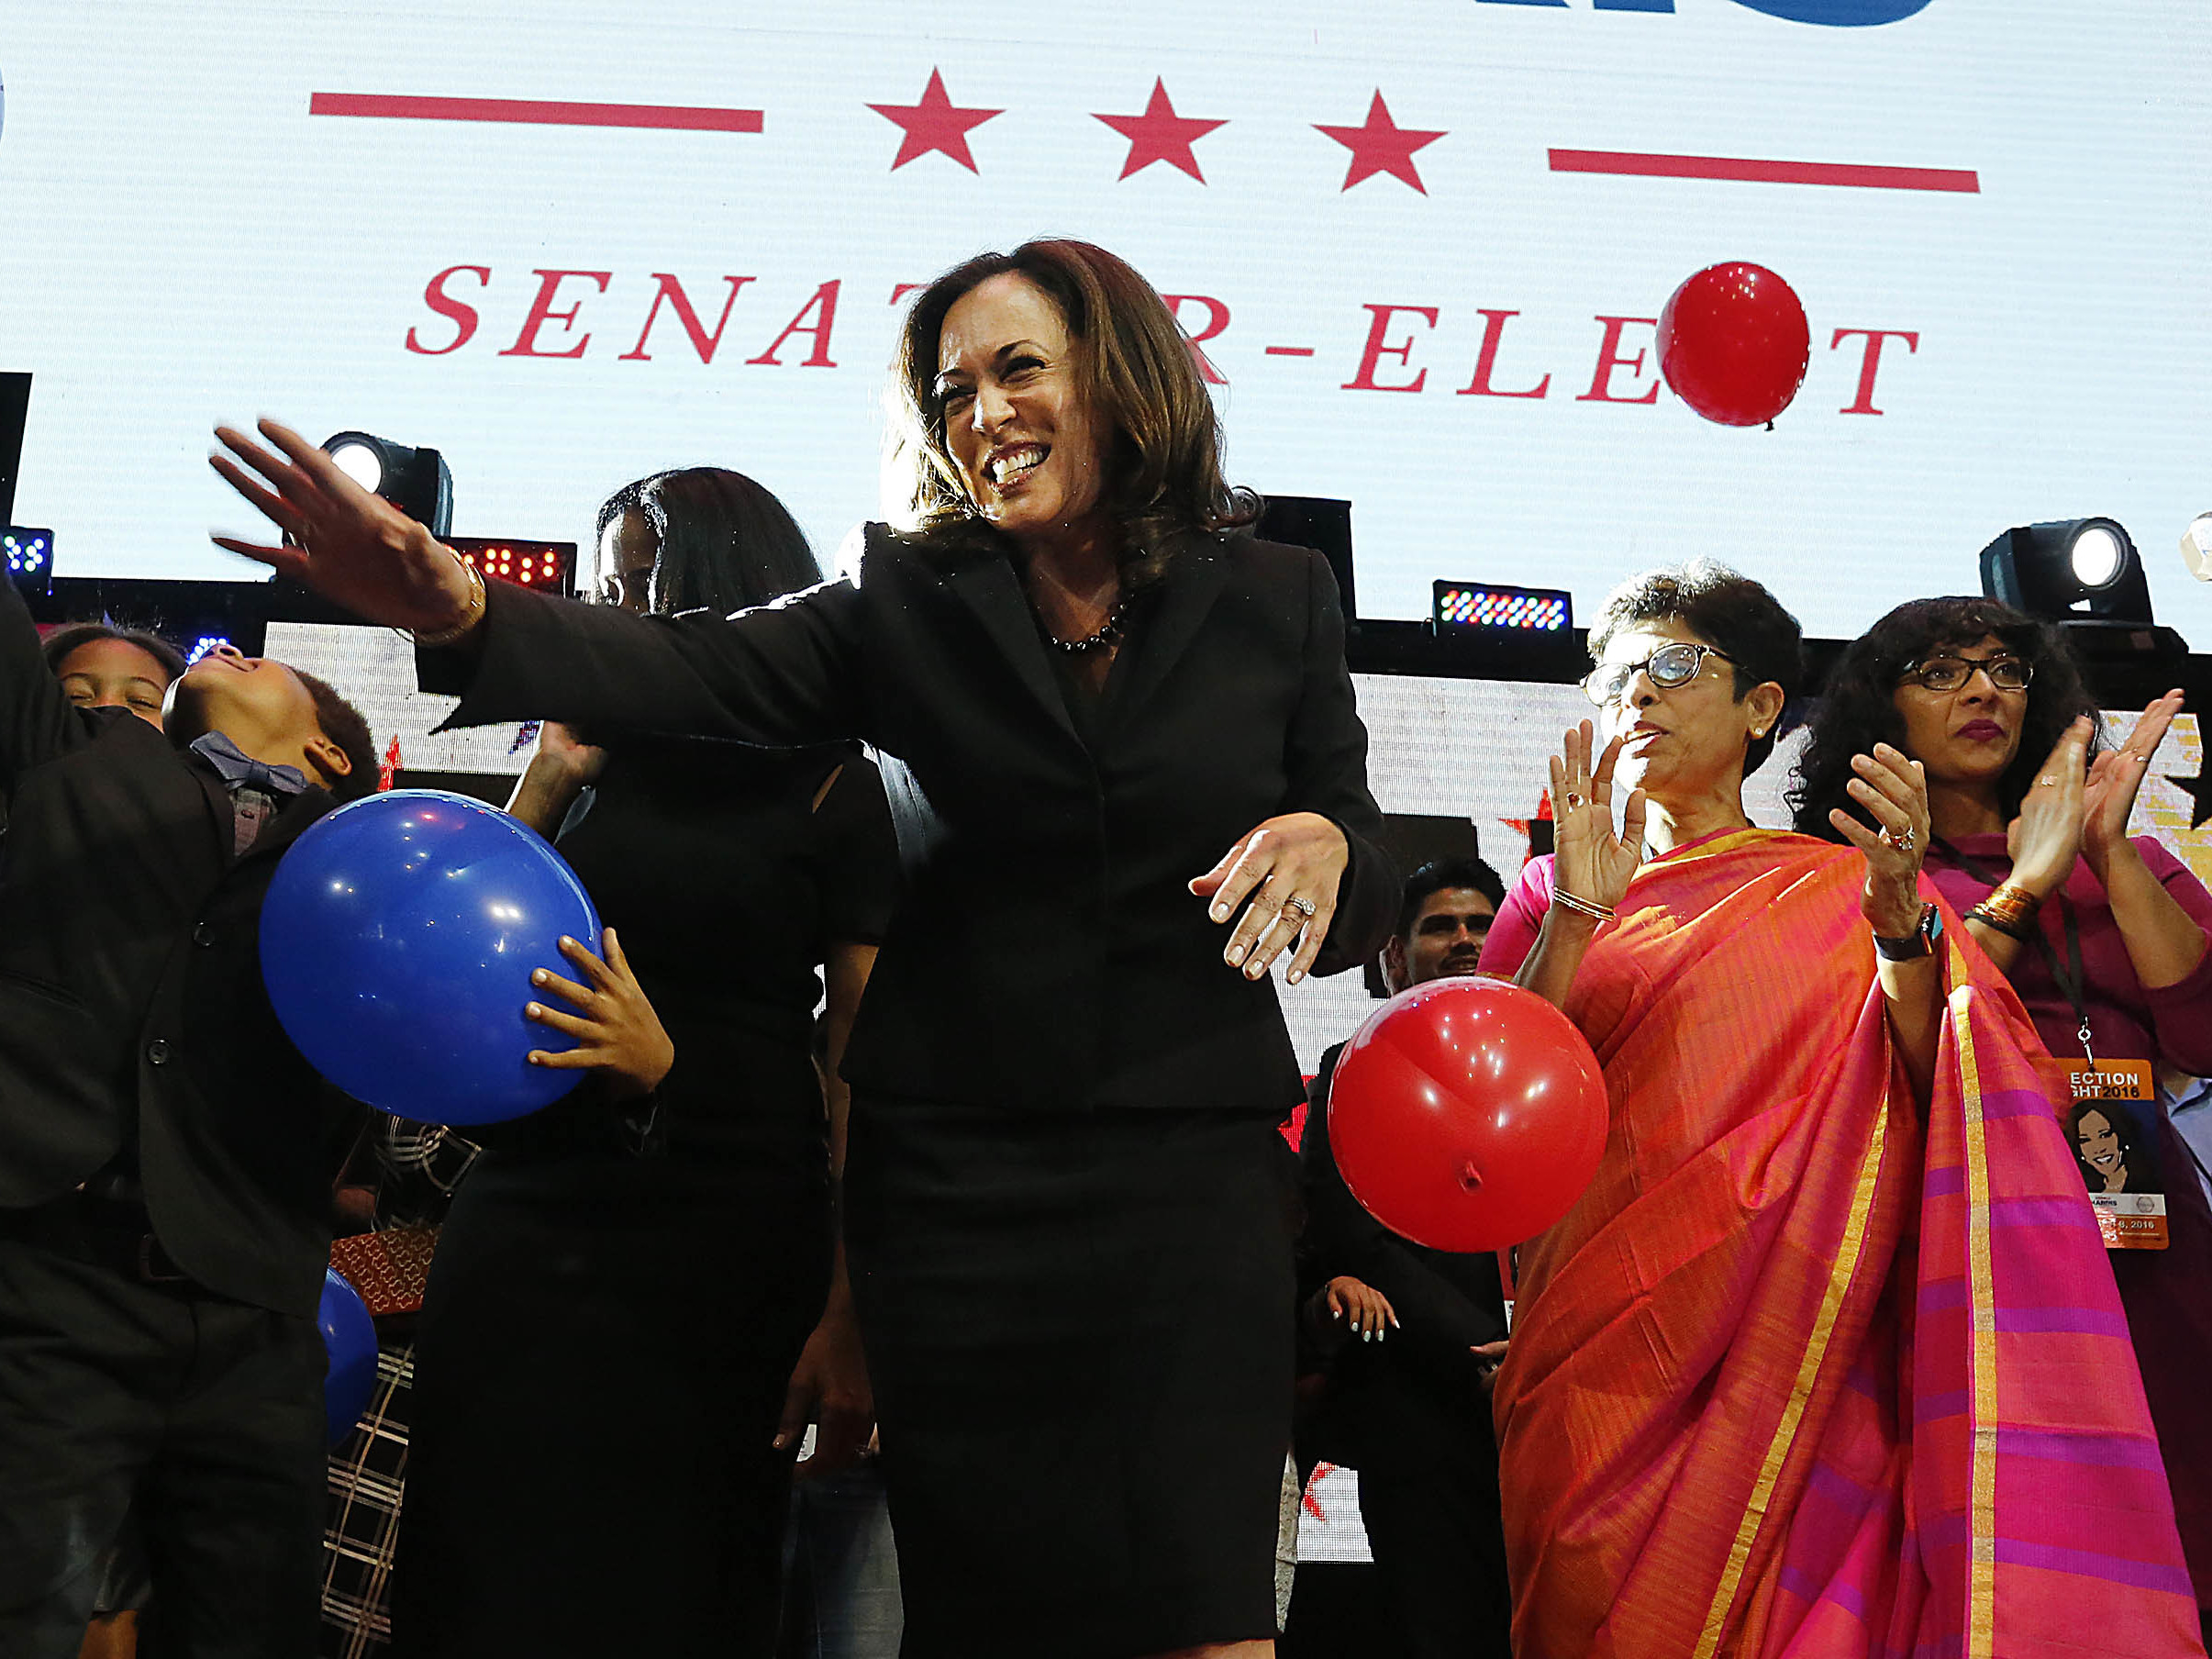 Catherine Cortez Masto wins in Nevada, keeping Harry Reid's Senate seat blue